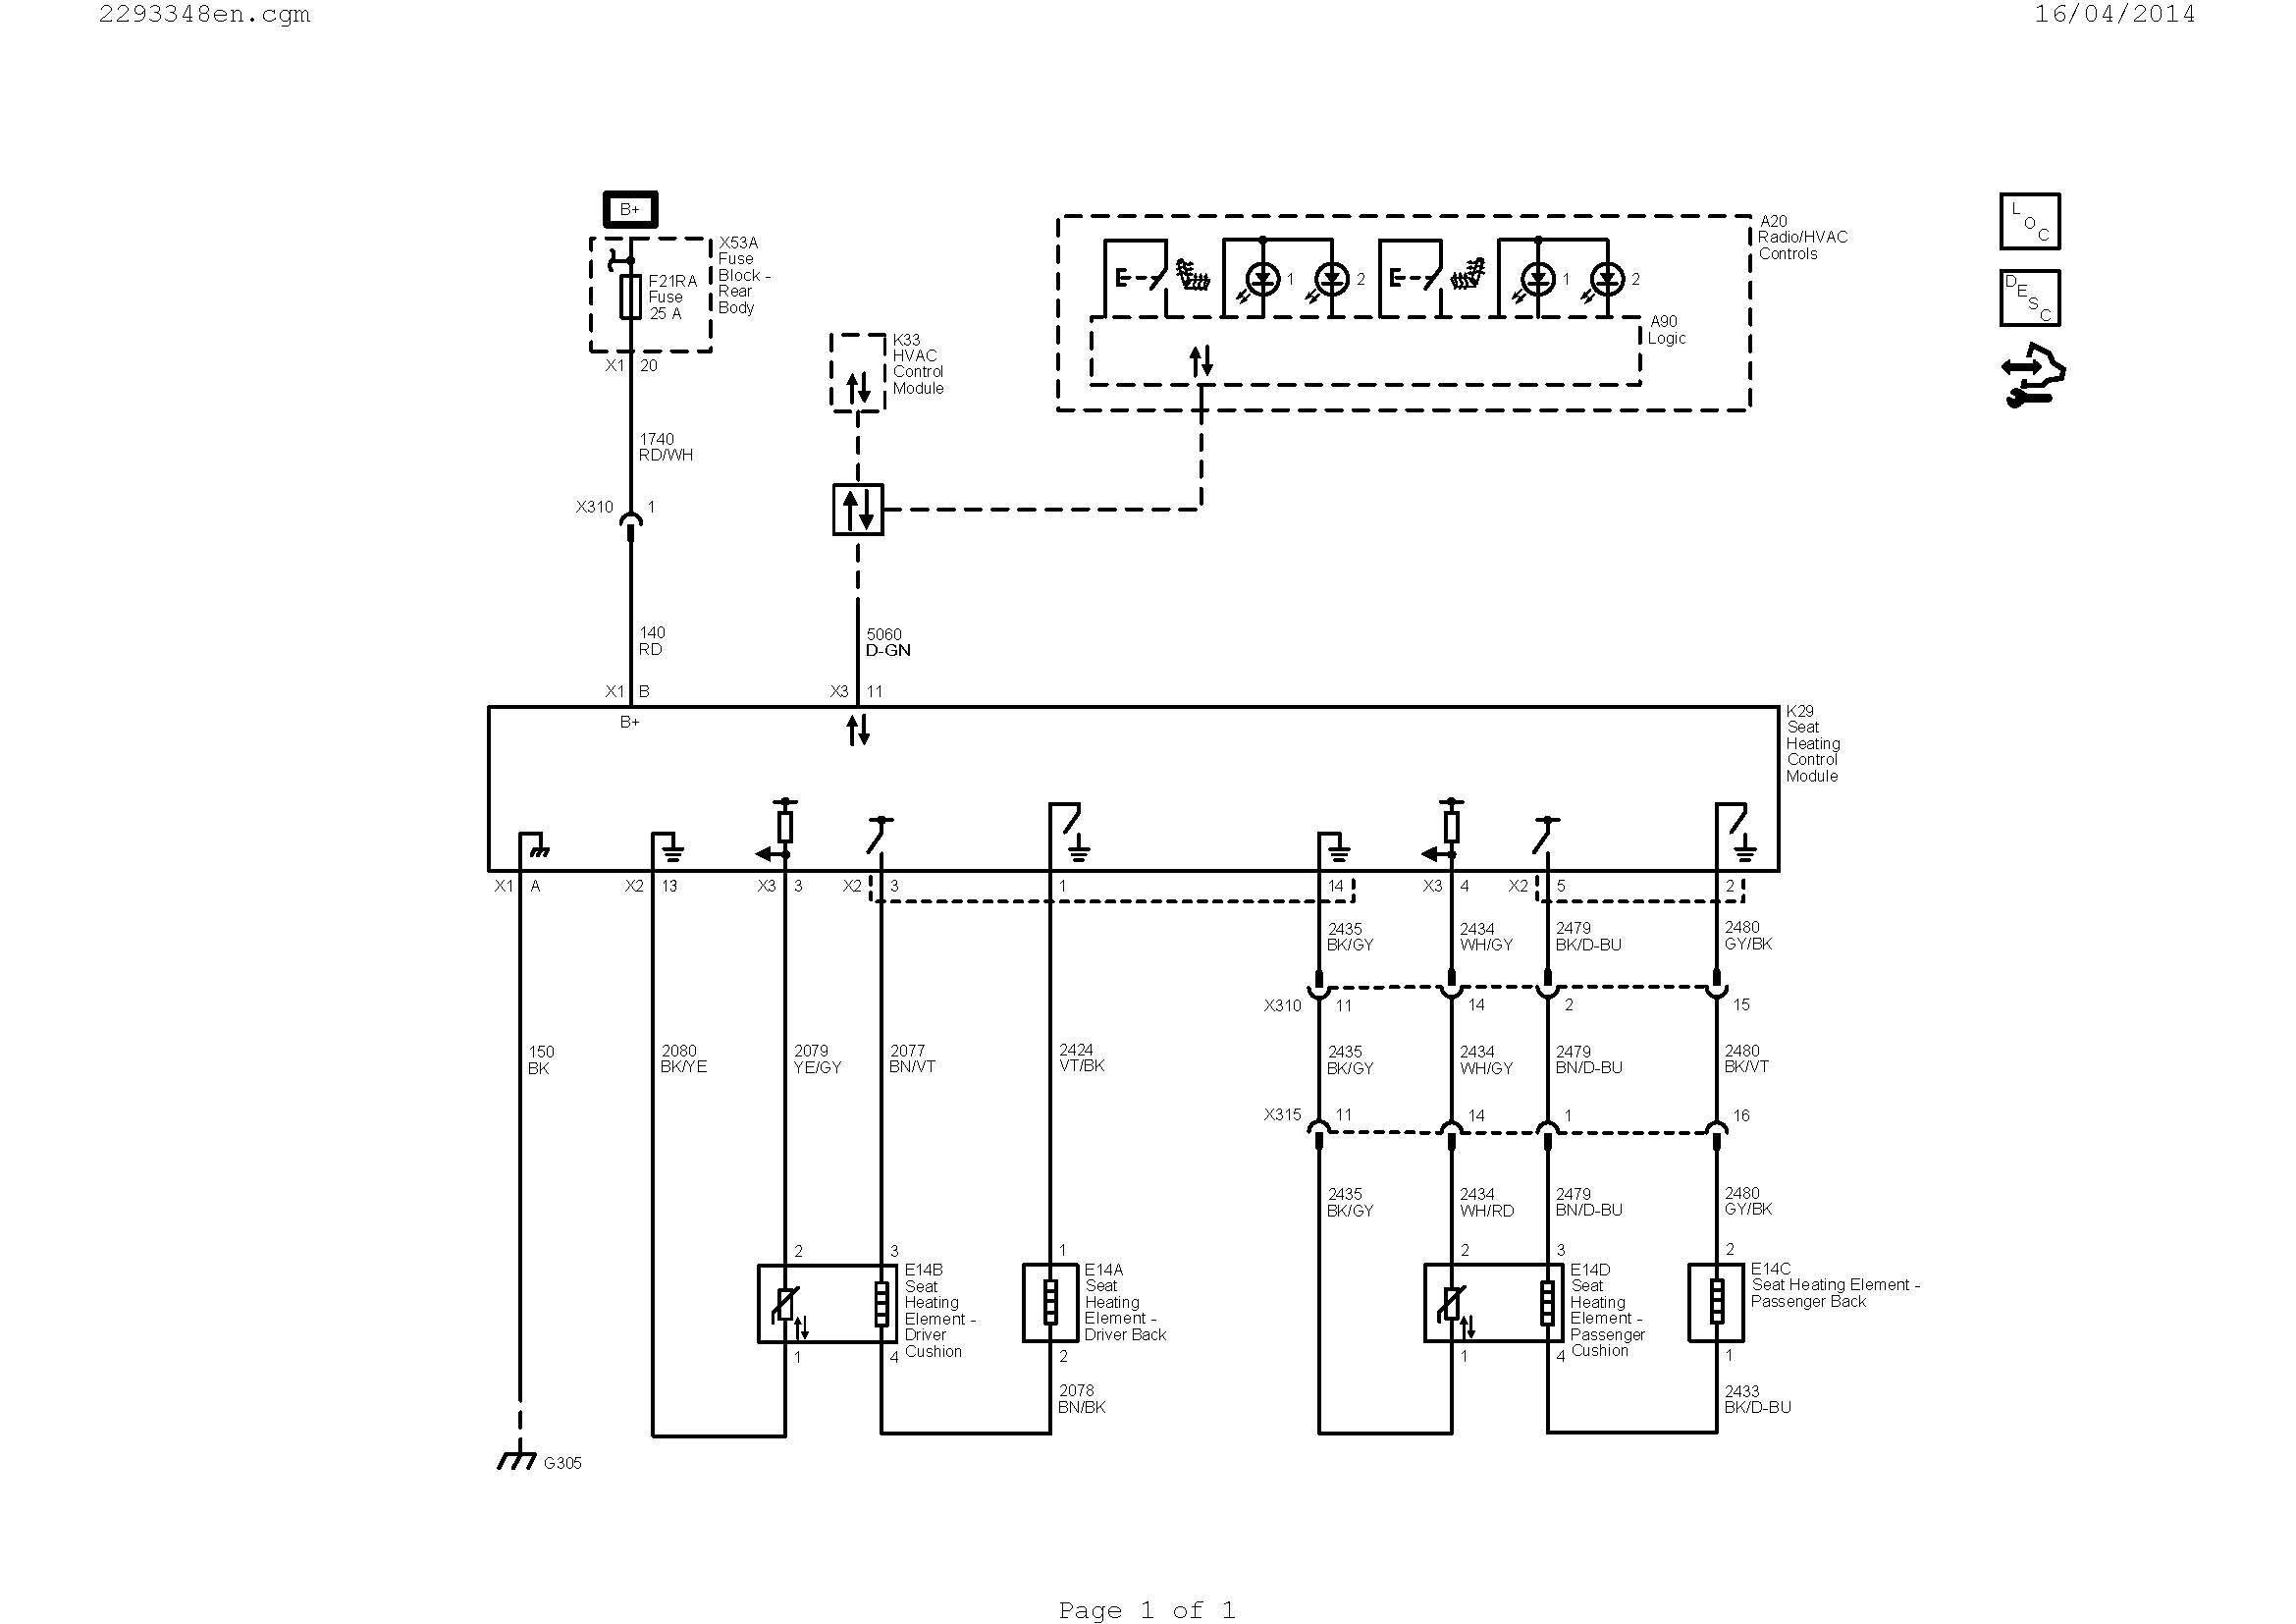 automotive wiring diagram board diagram best automotive wiring diagrams elegant hvac of automotive wiring diagram